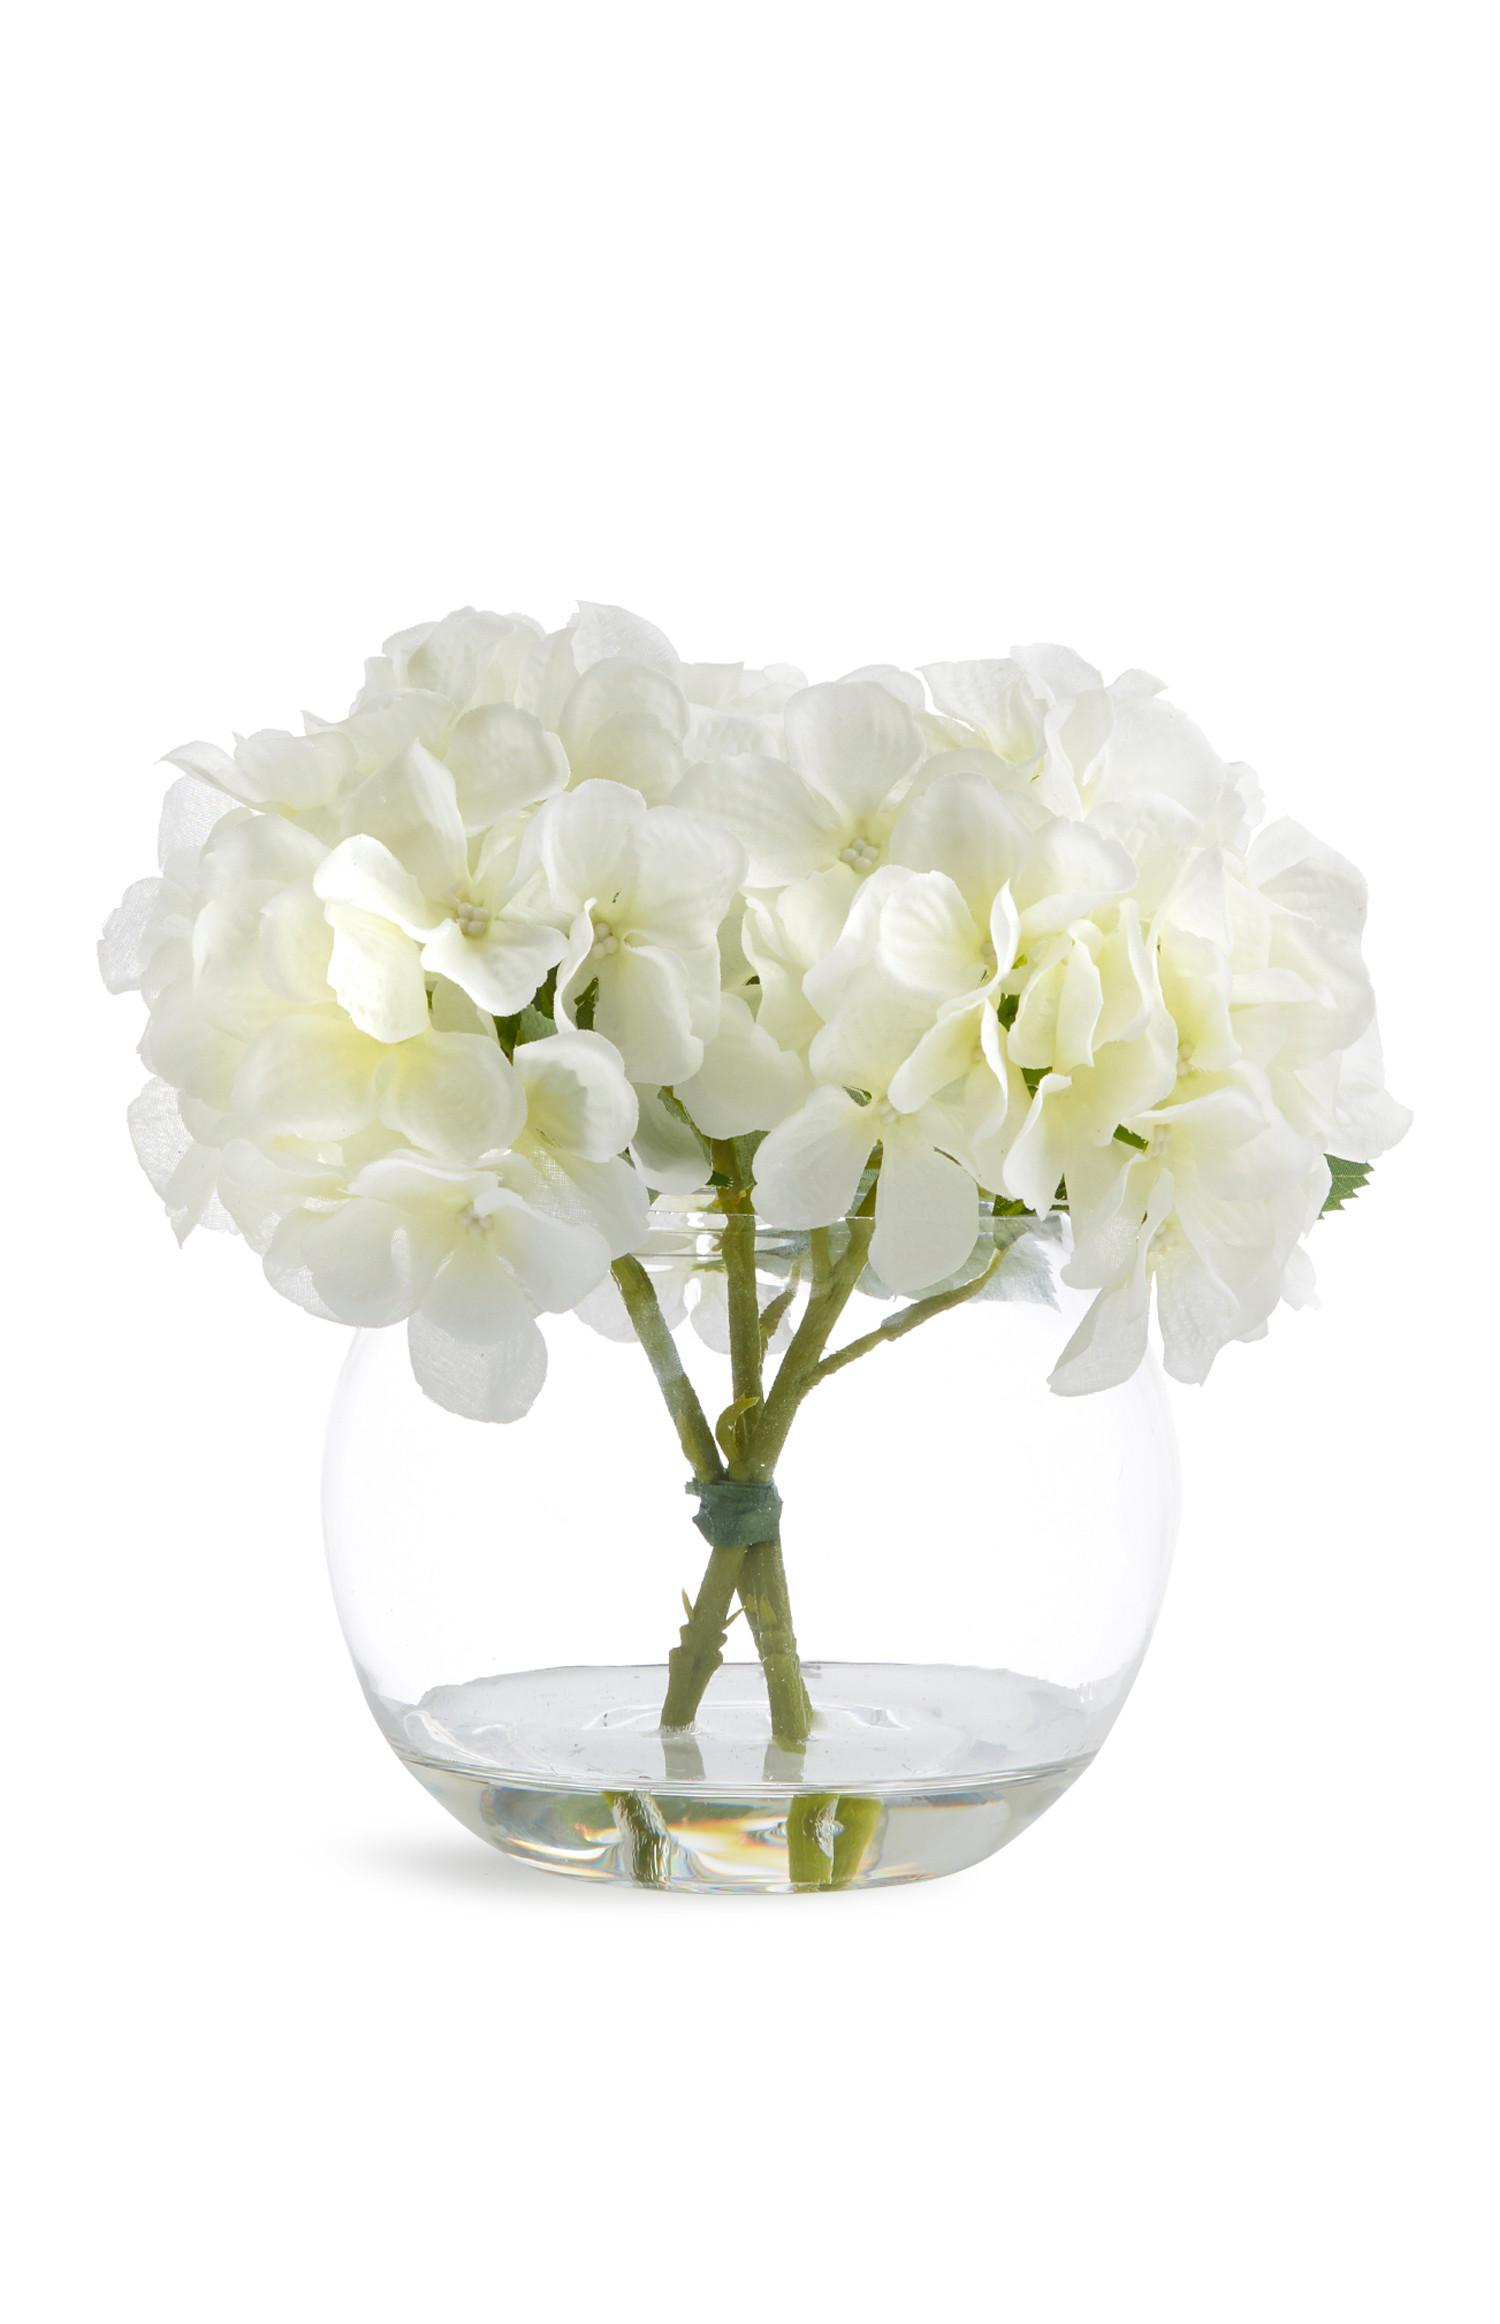 Faux Flower Glass Bowl